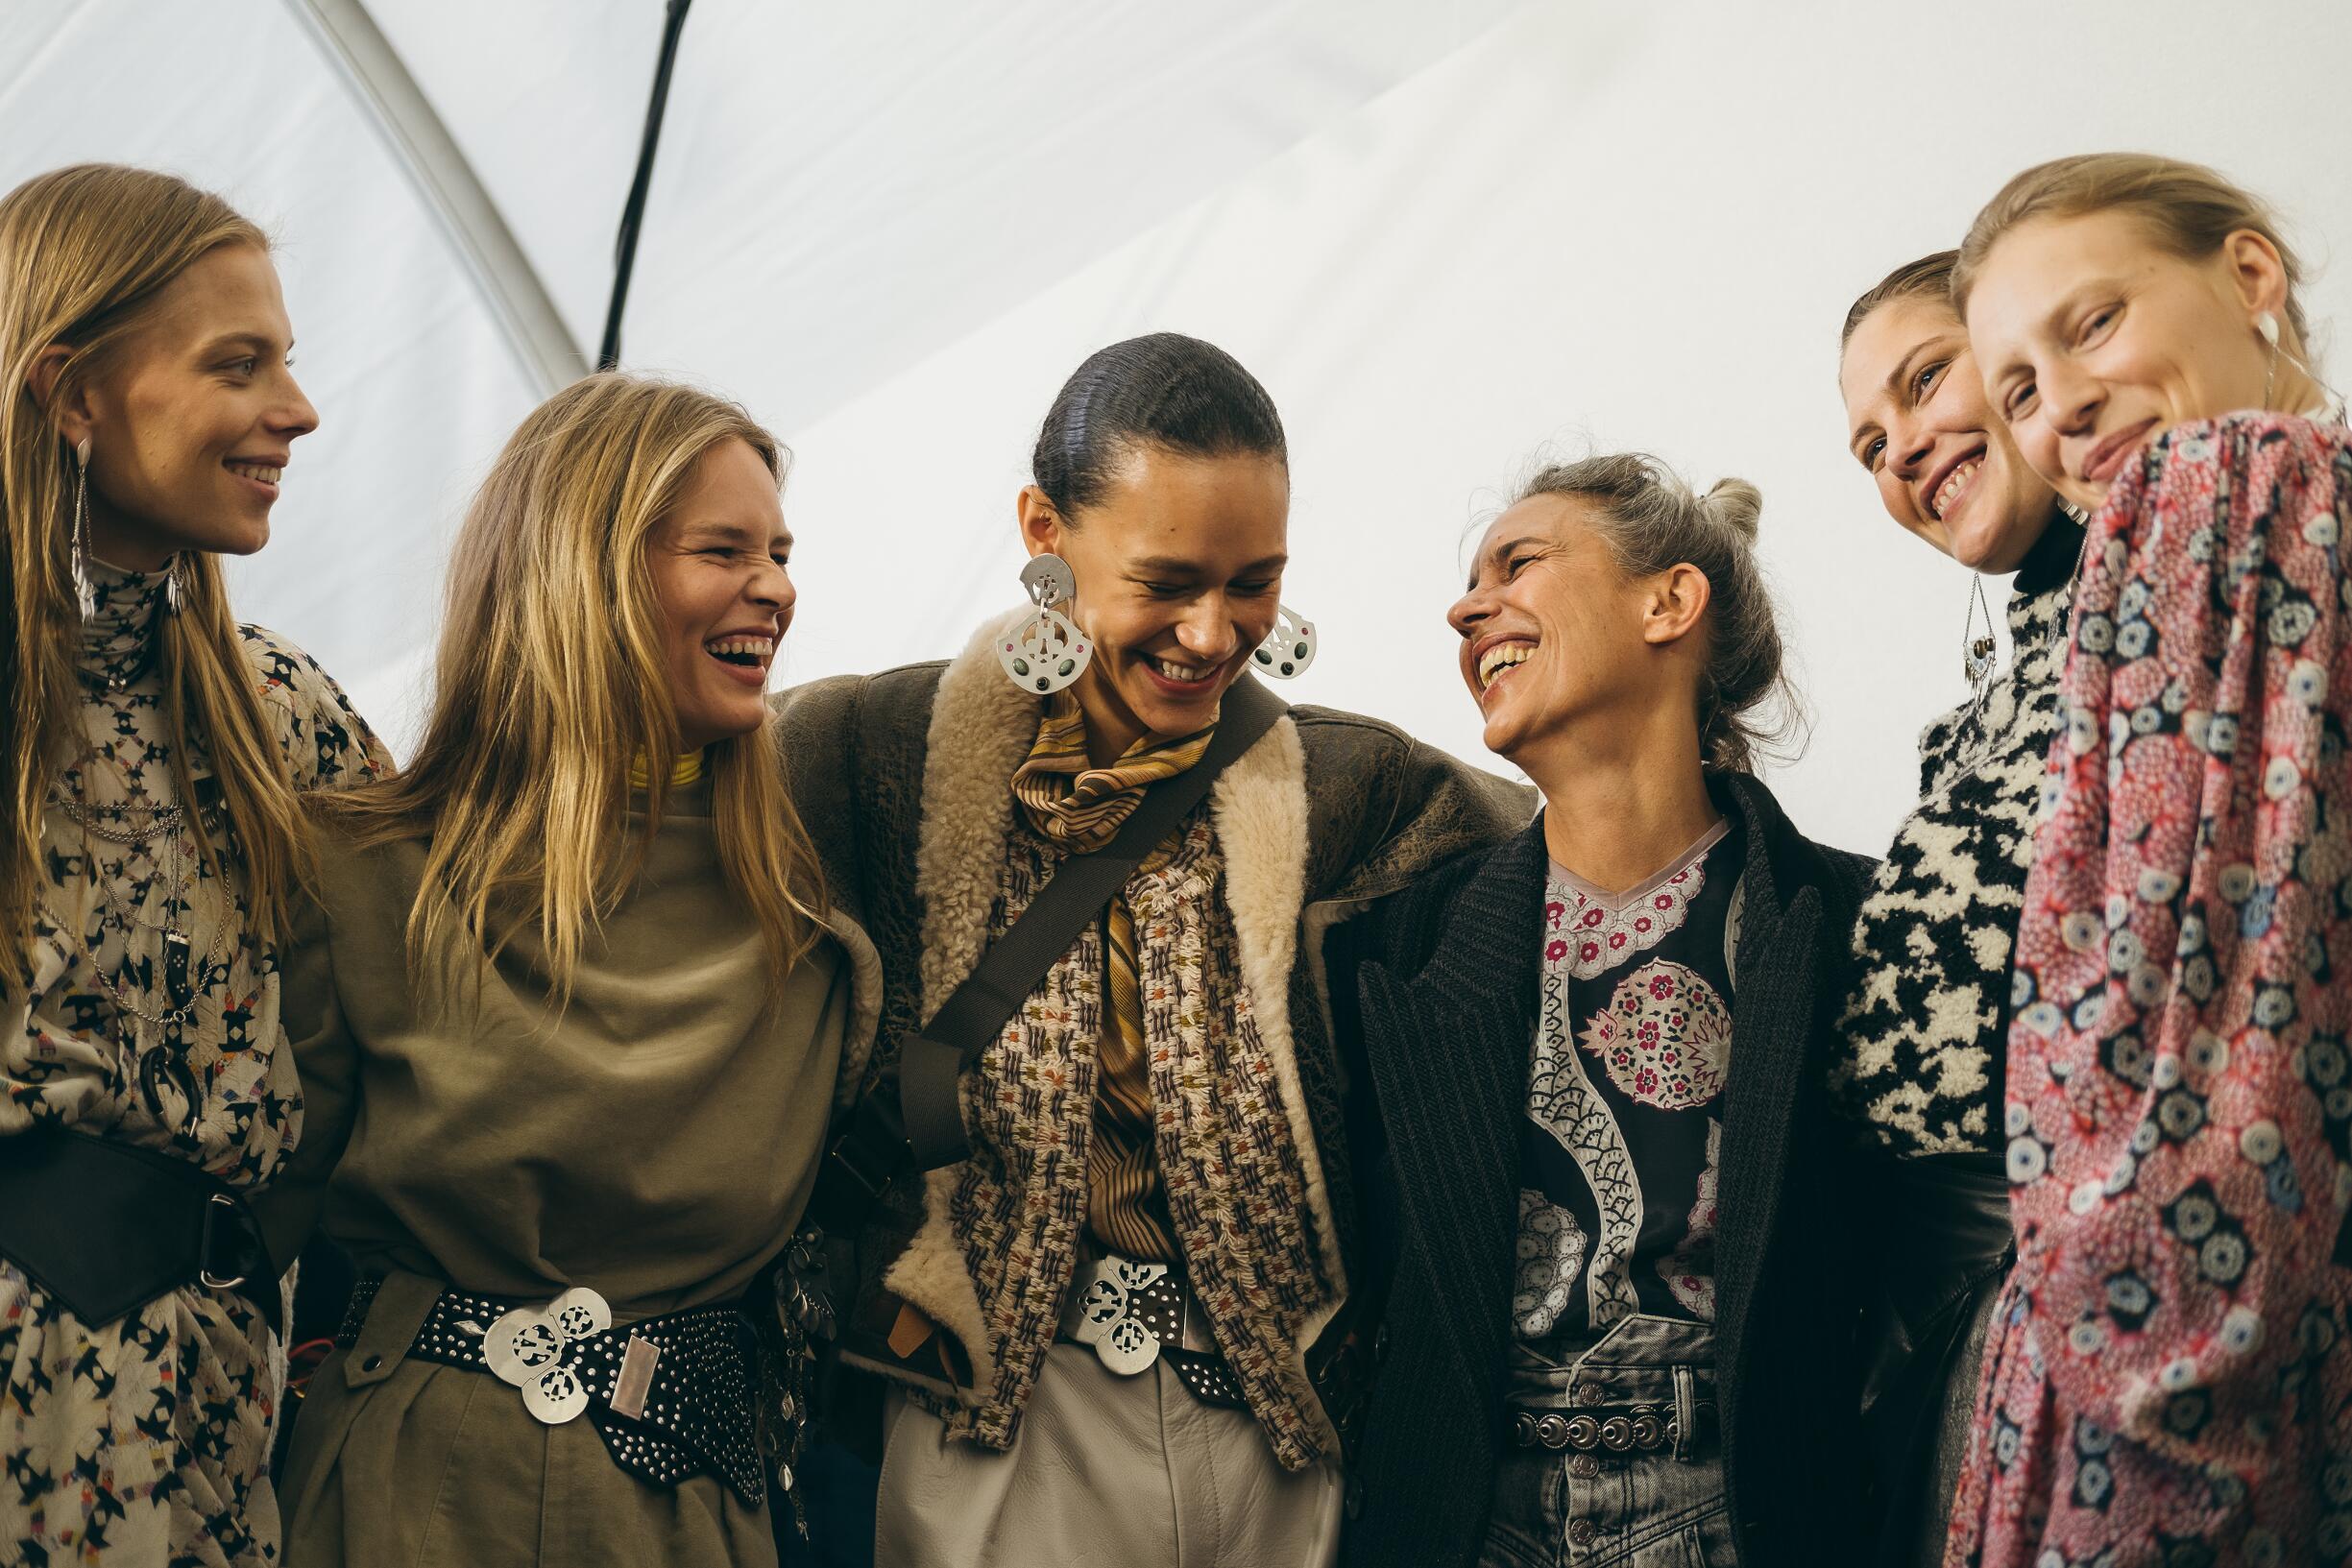 Isabel Marant with Models 2019